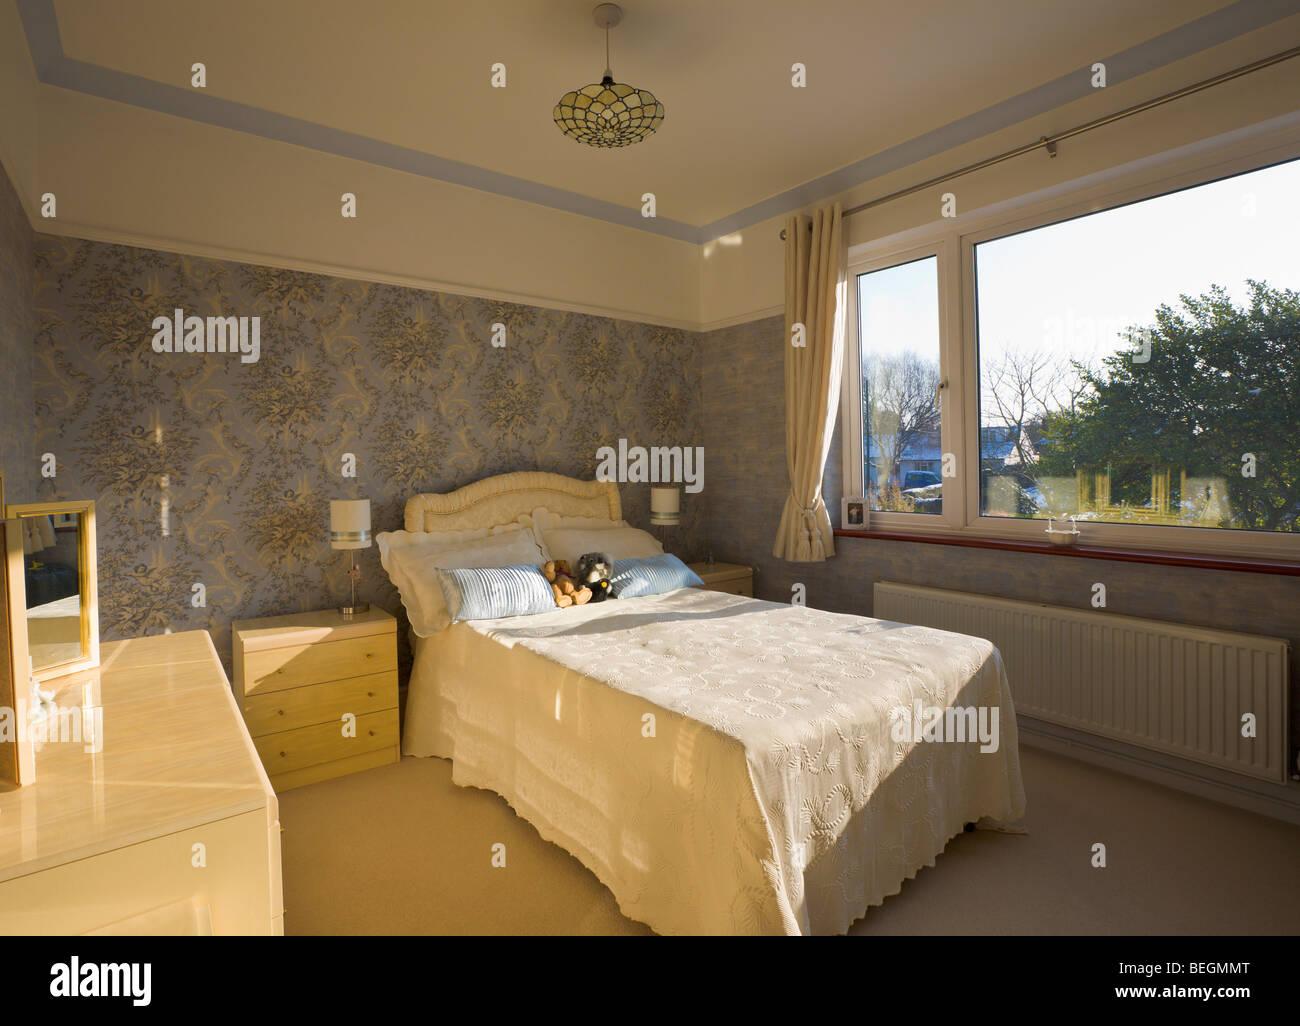 Dormitorio de matrimonio Imagen De Stock